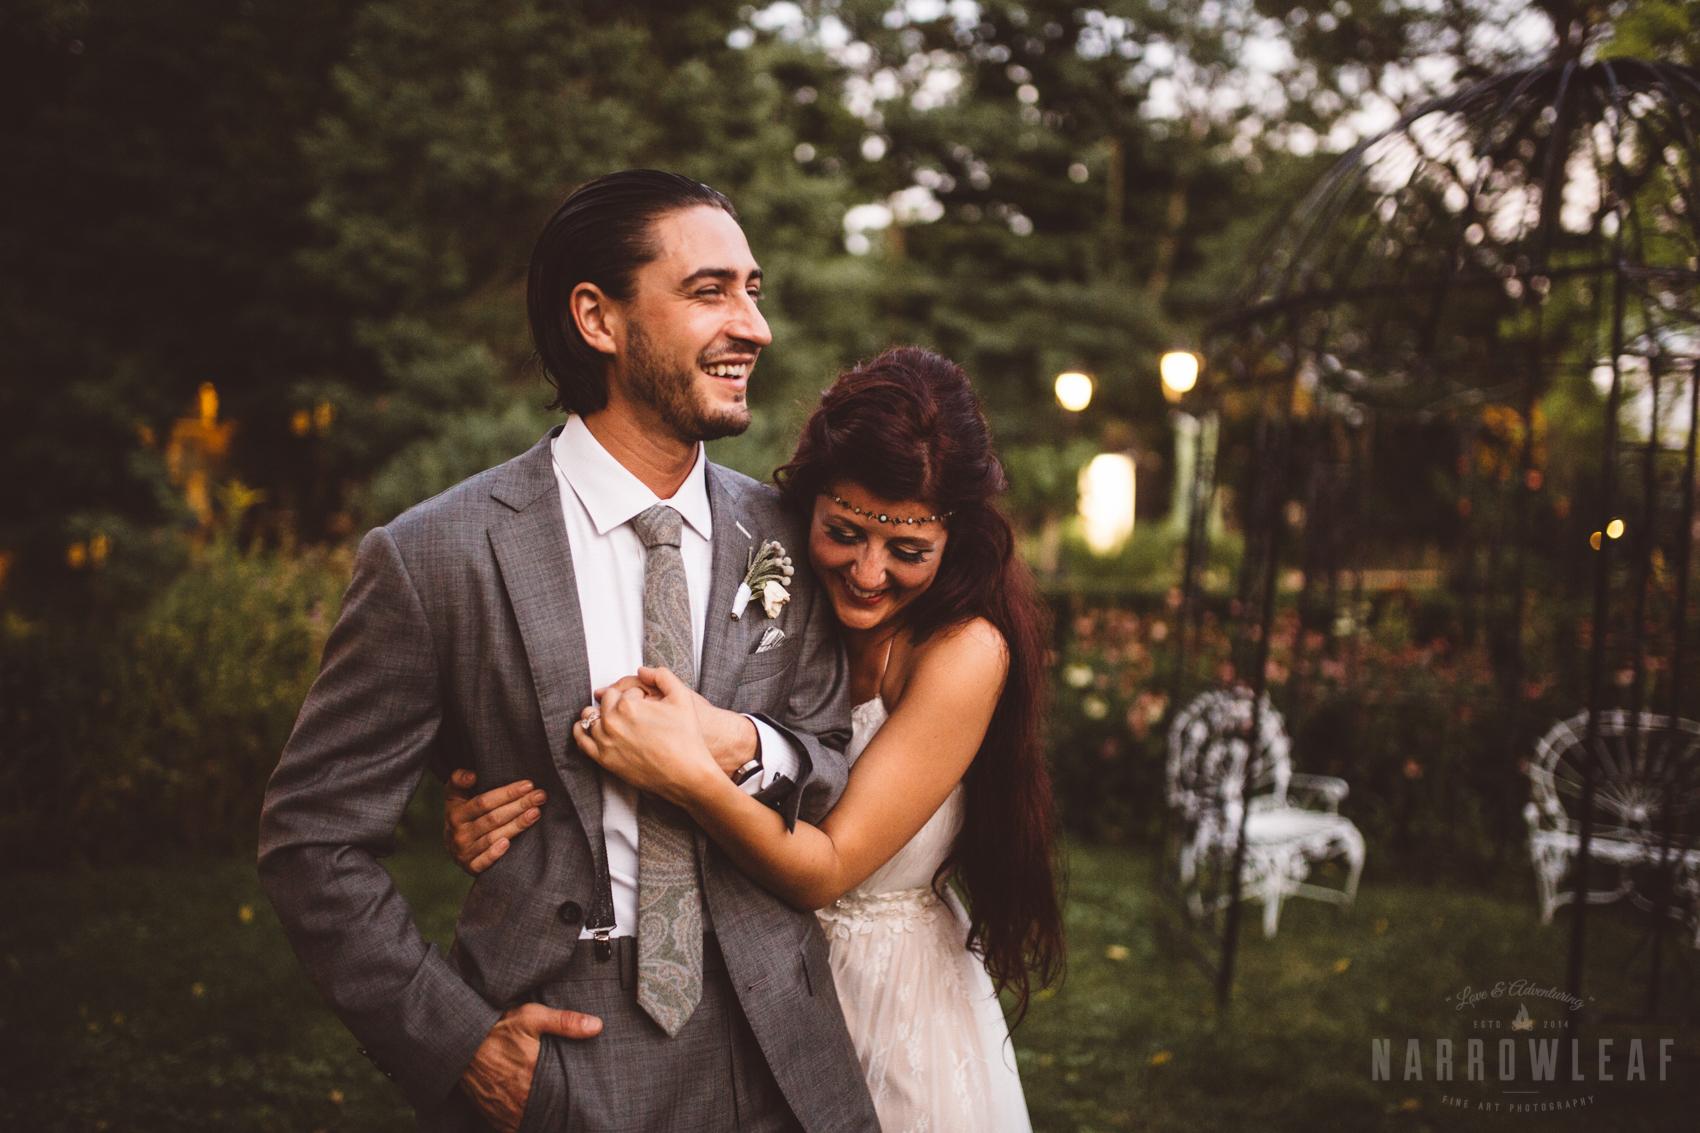 Lake-Geneva-Wisconsin-Wedding-sunset-bride-groom-formals-4917.jpg